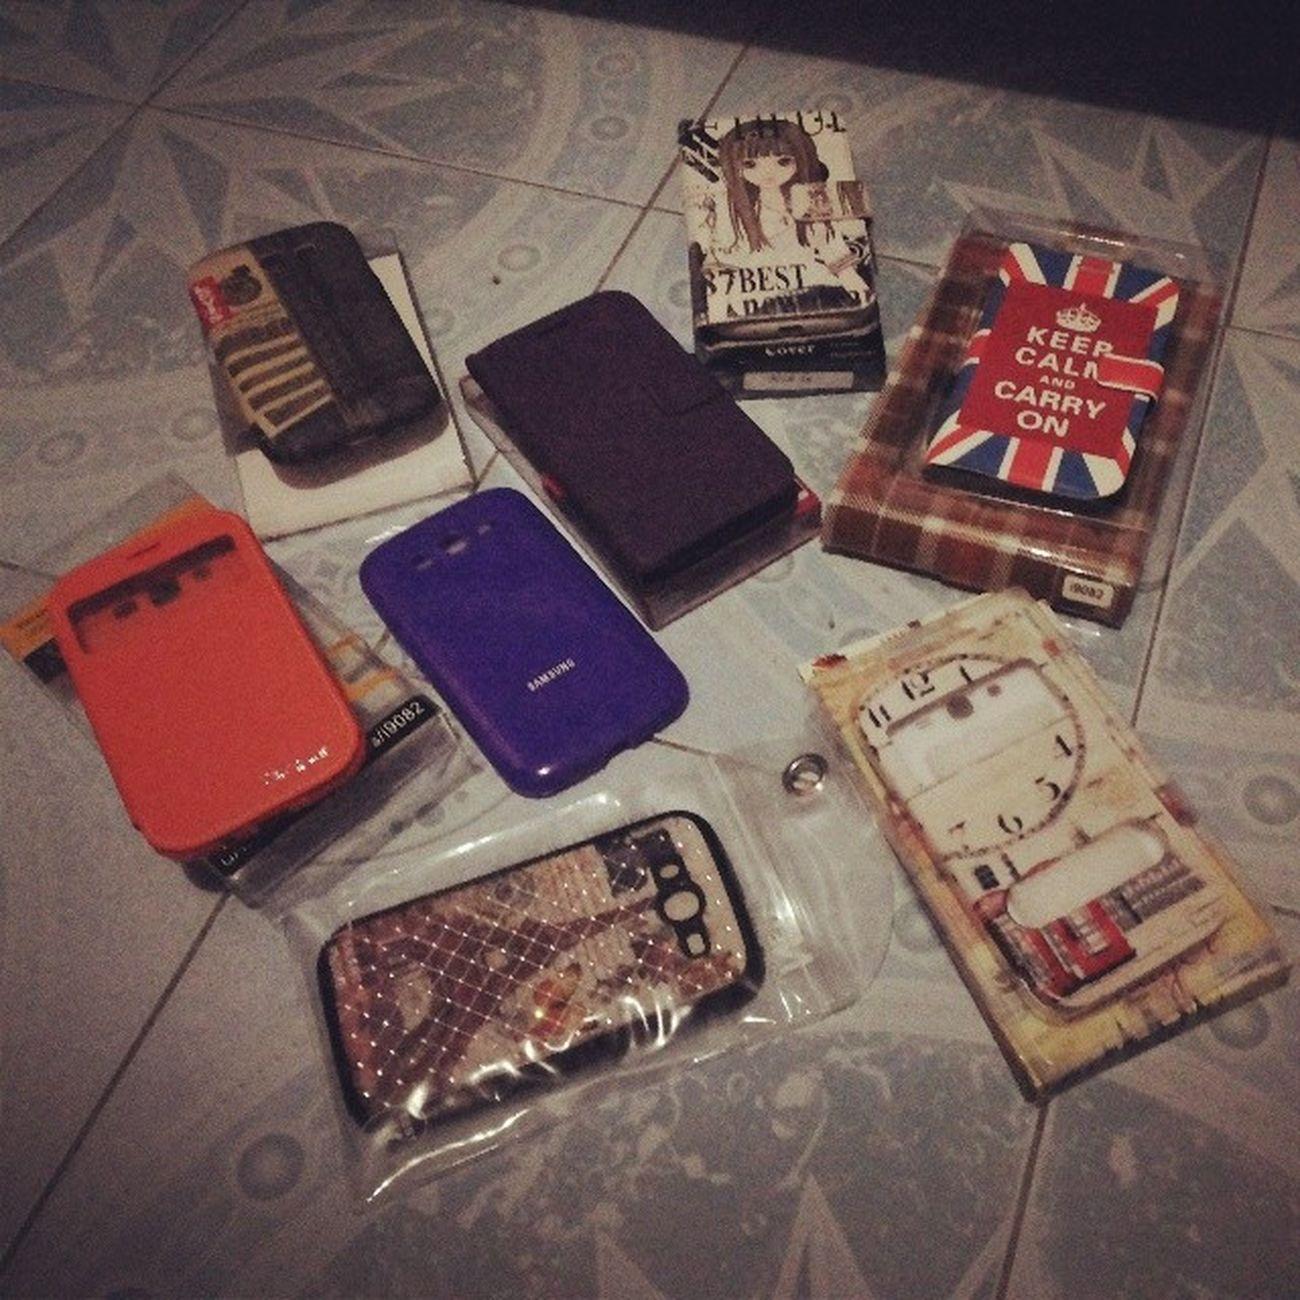 My collection case Flip Case Vintage Keepcalmandcarryon levi's targus orange .... kyak gini aje abis 500rbu :(